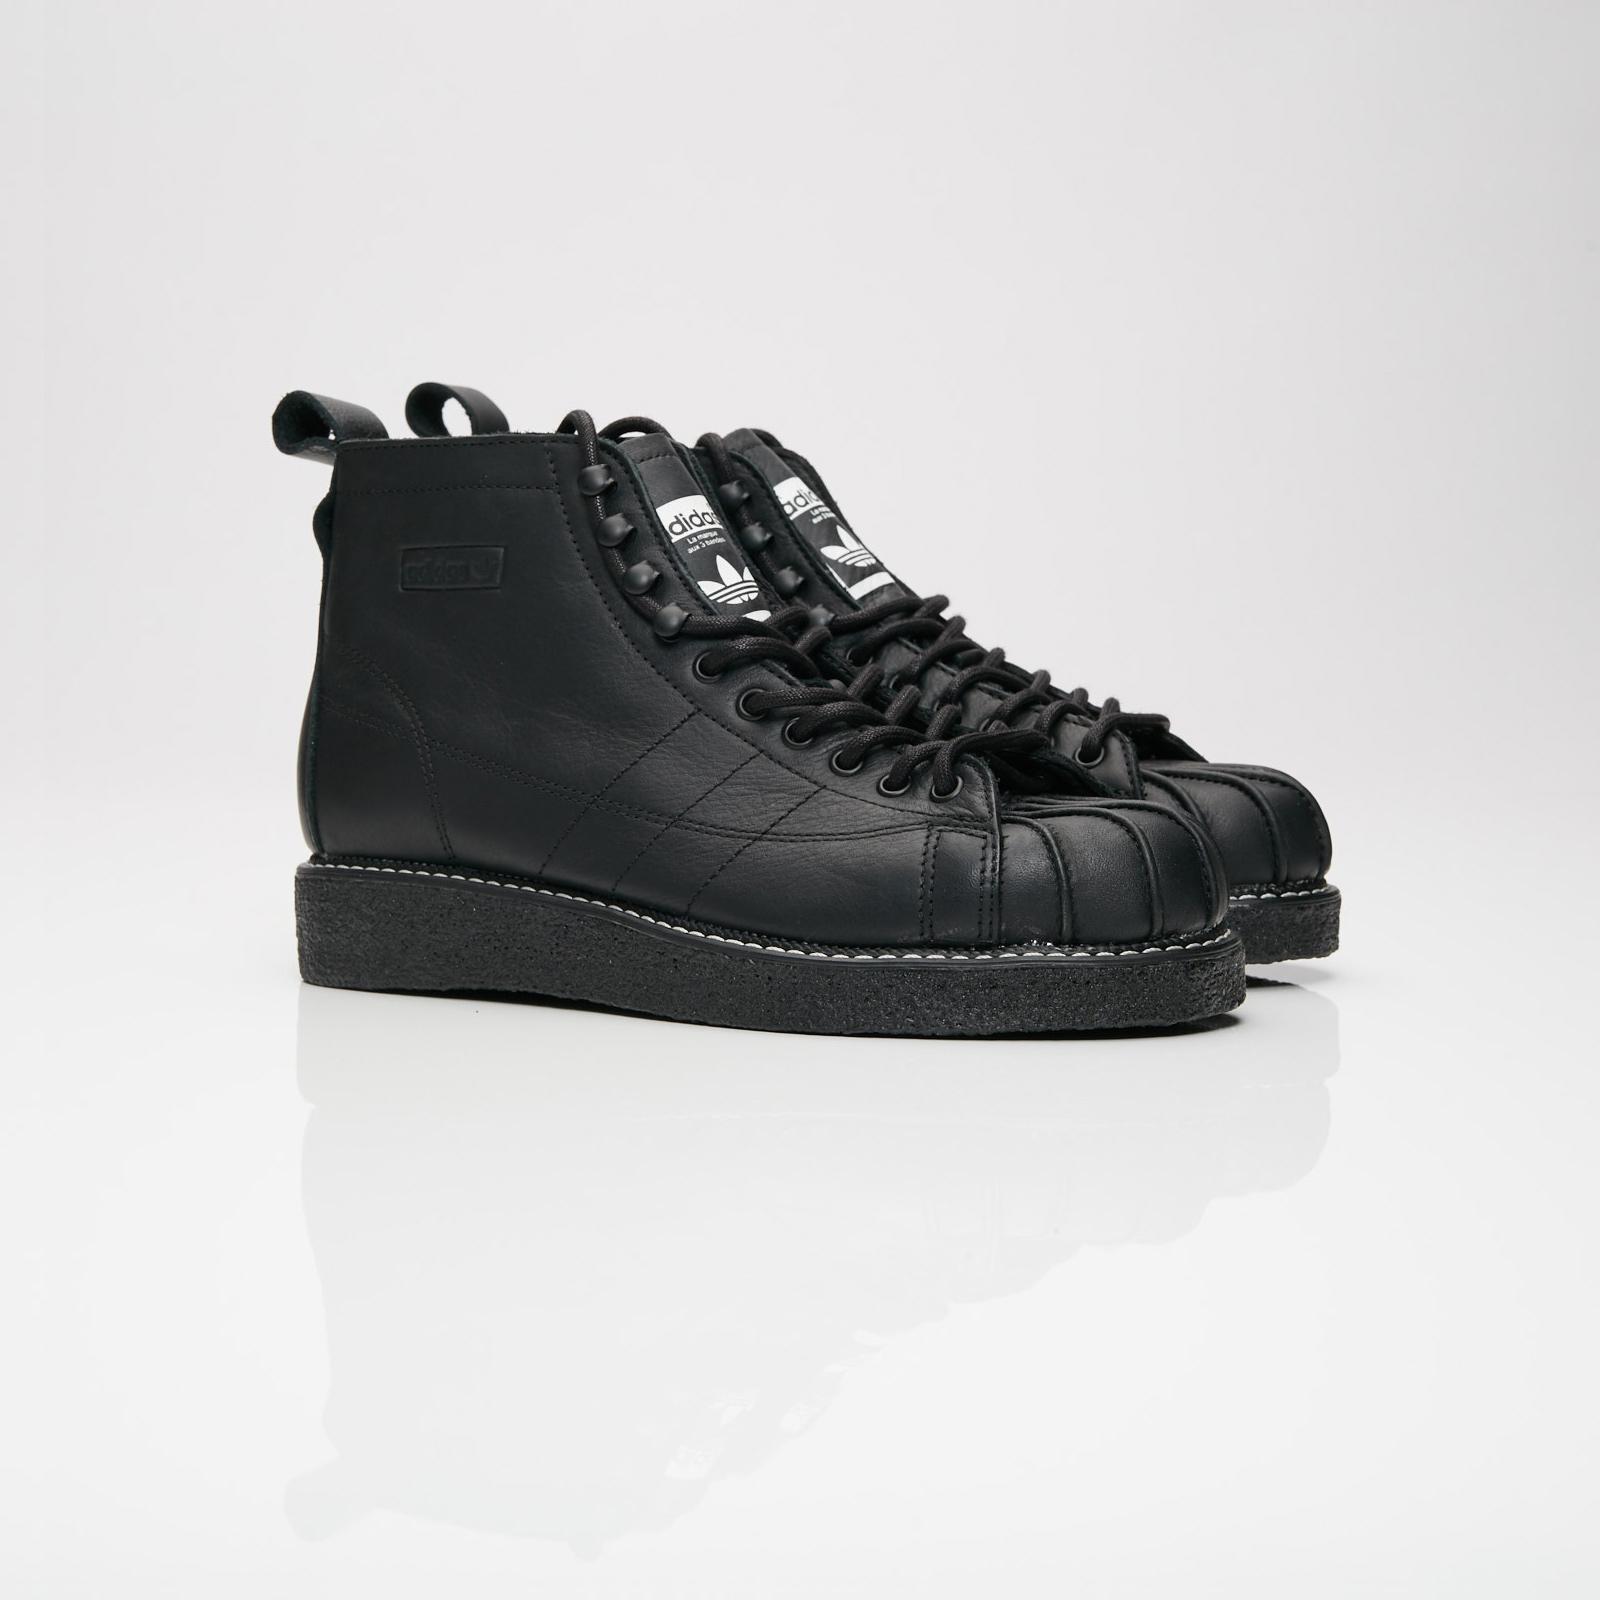 adidas Superstar Boot Luxe W - Aq1250